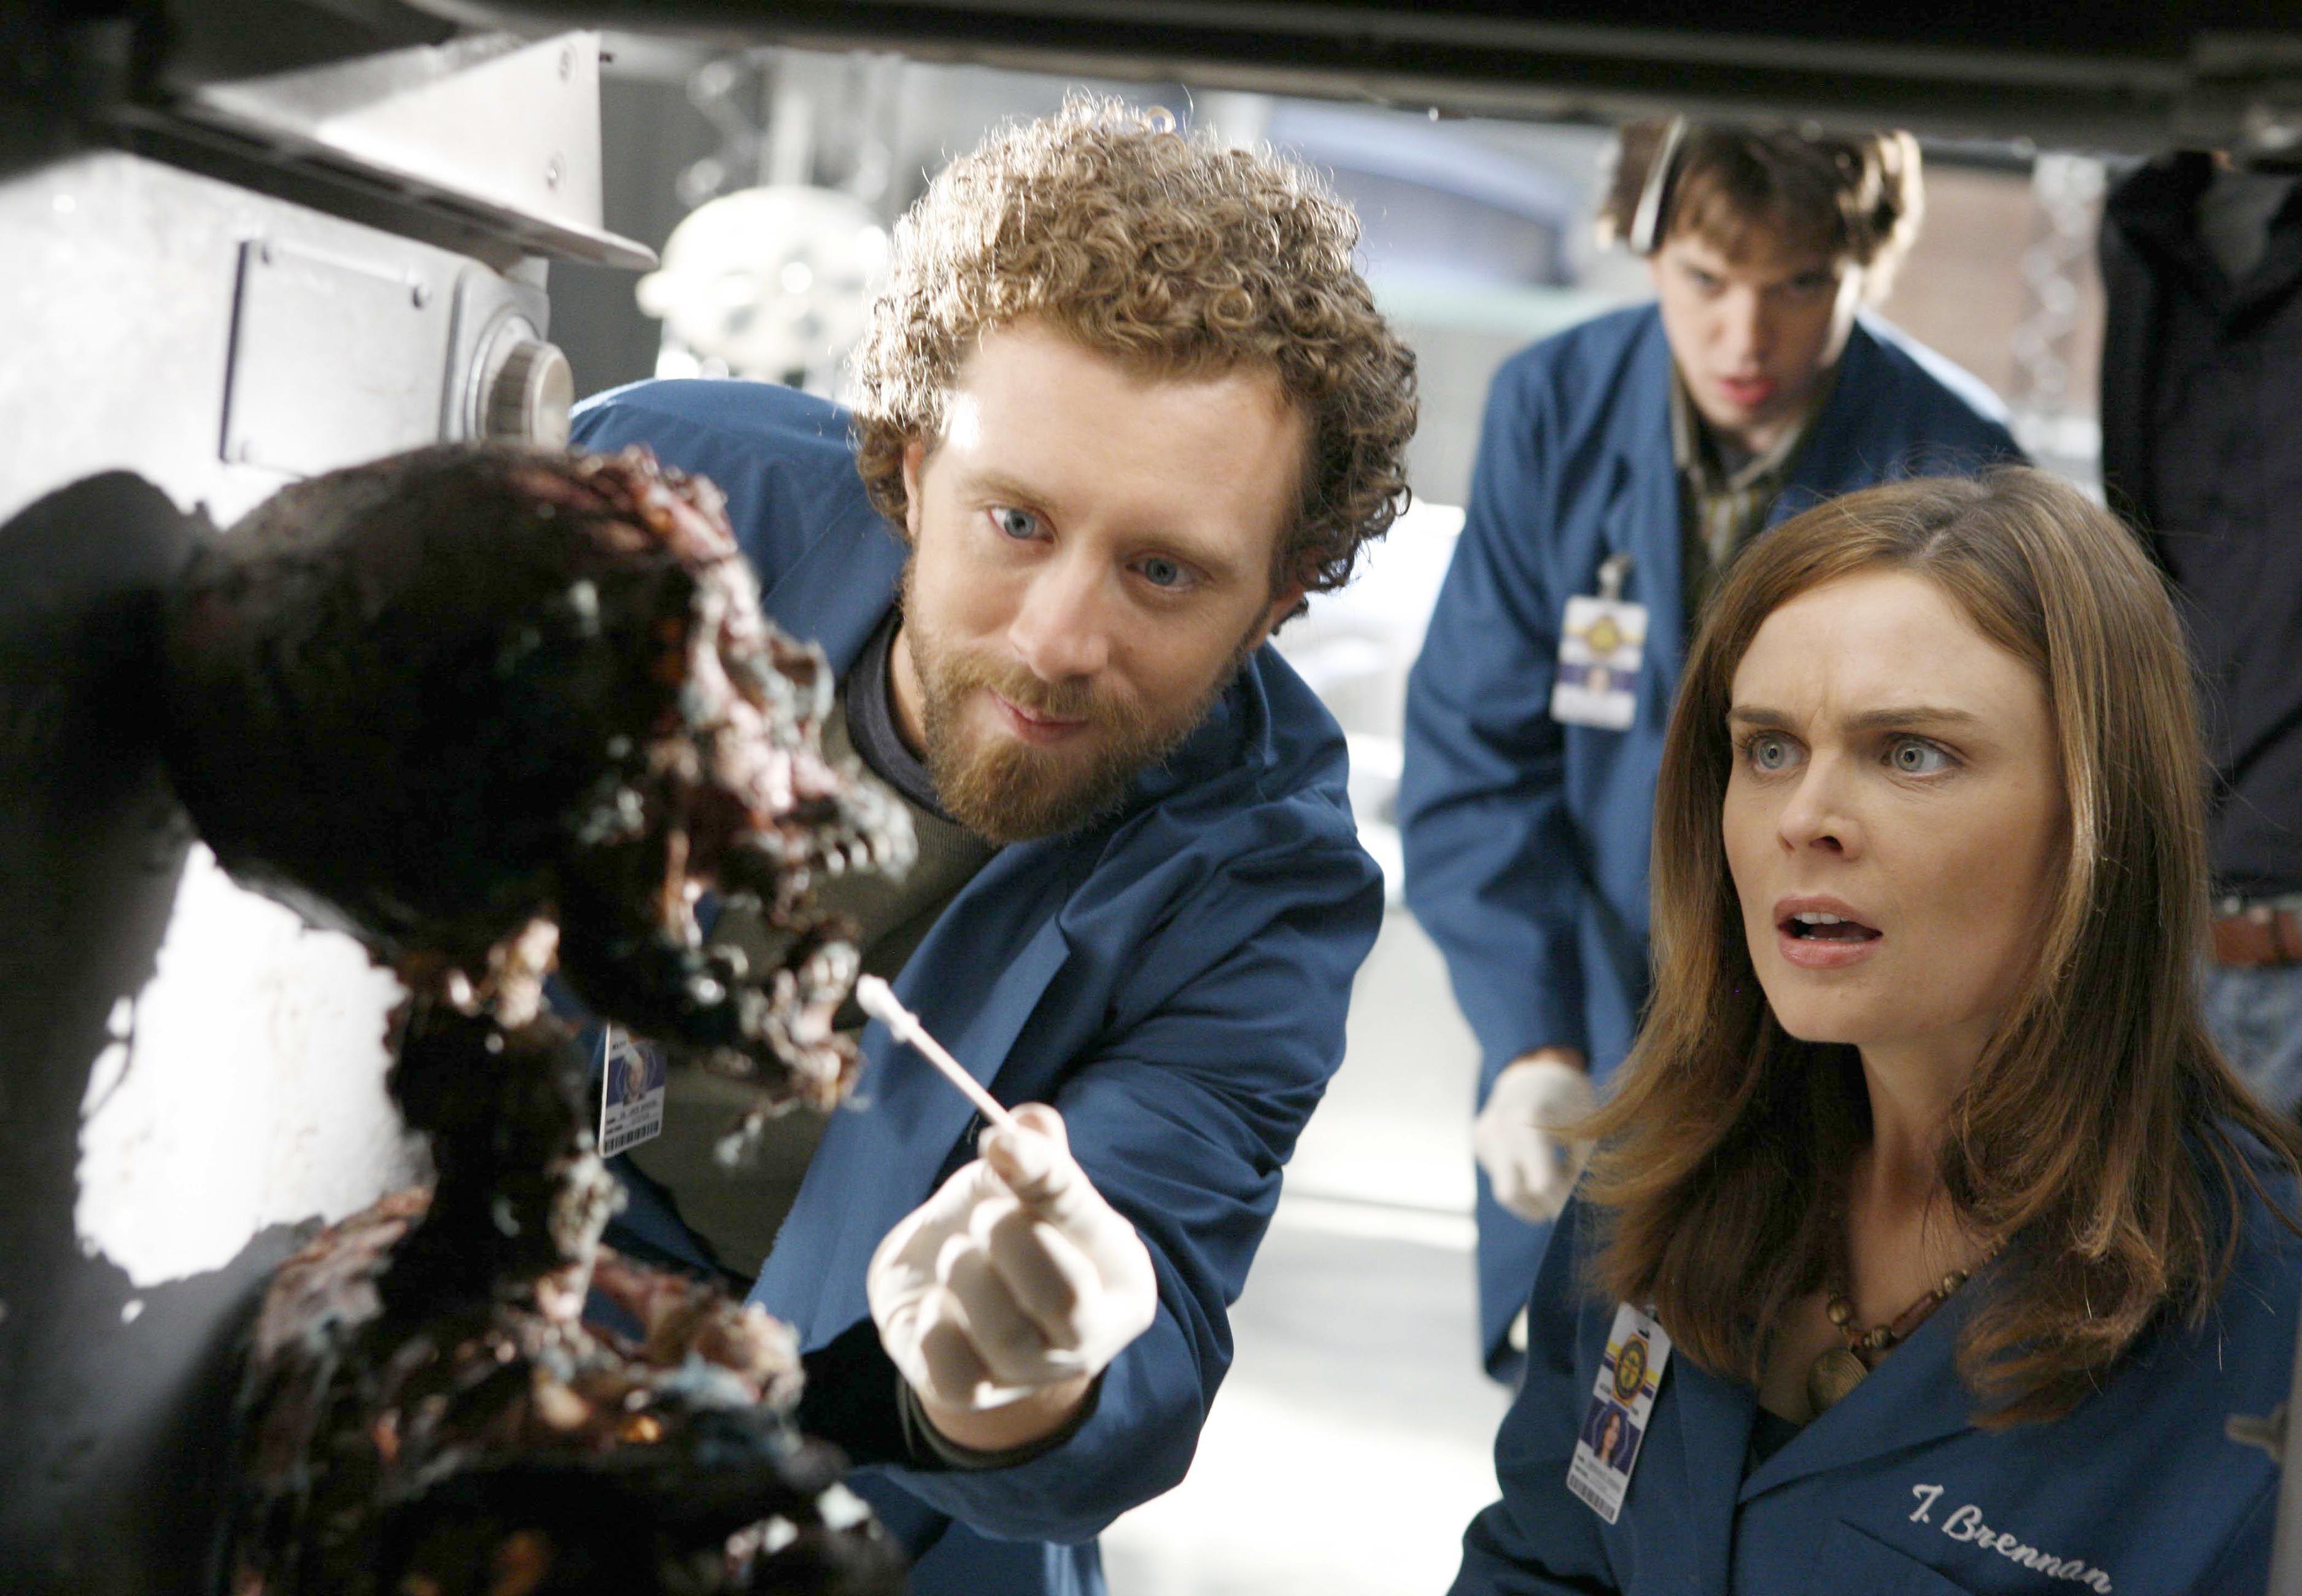 Bones Season 1 Episode 8 The Girl In The Fridge T J Thyne As Dr Jack Hodgins And Emily Deschanel As Dr Temperance Bones Tv Series Bones Emily Deschanel